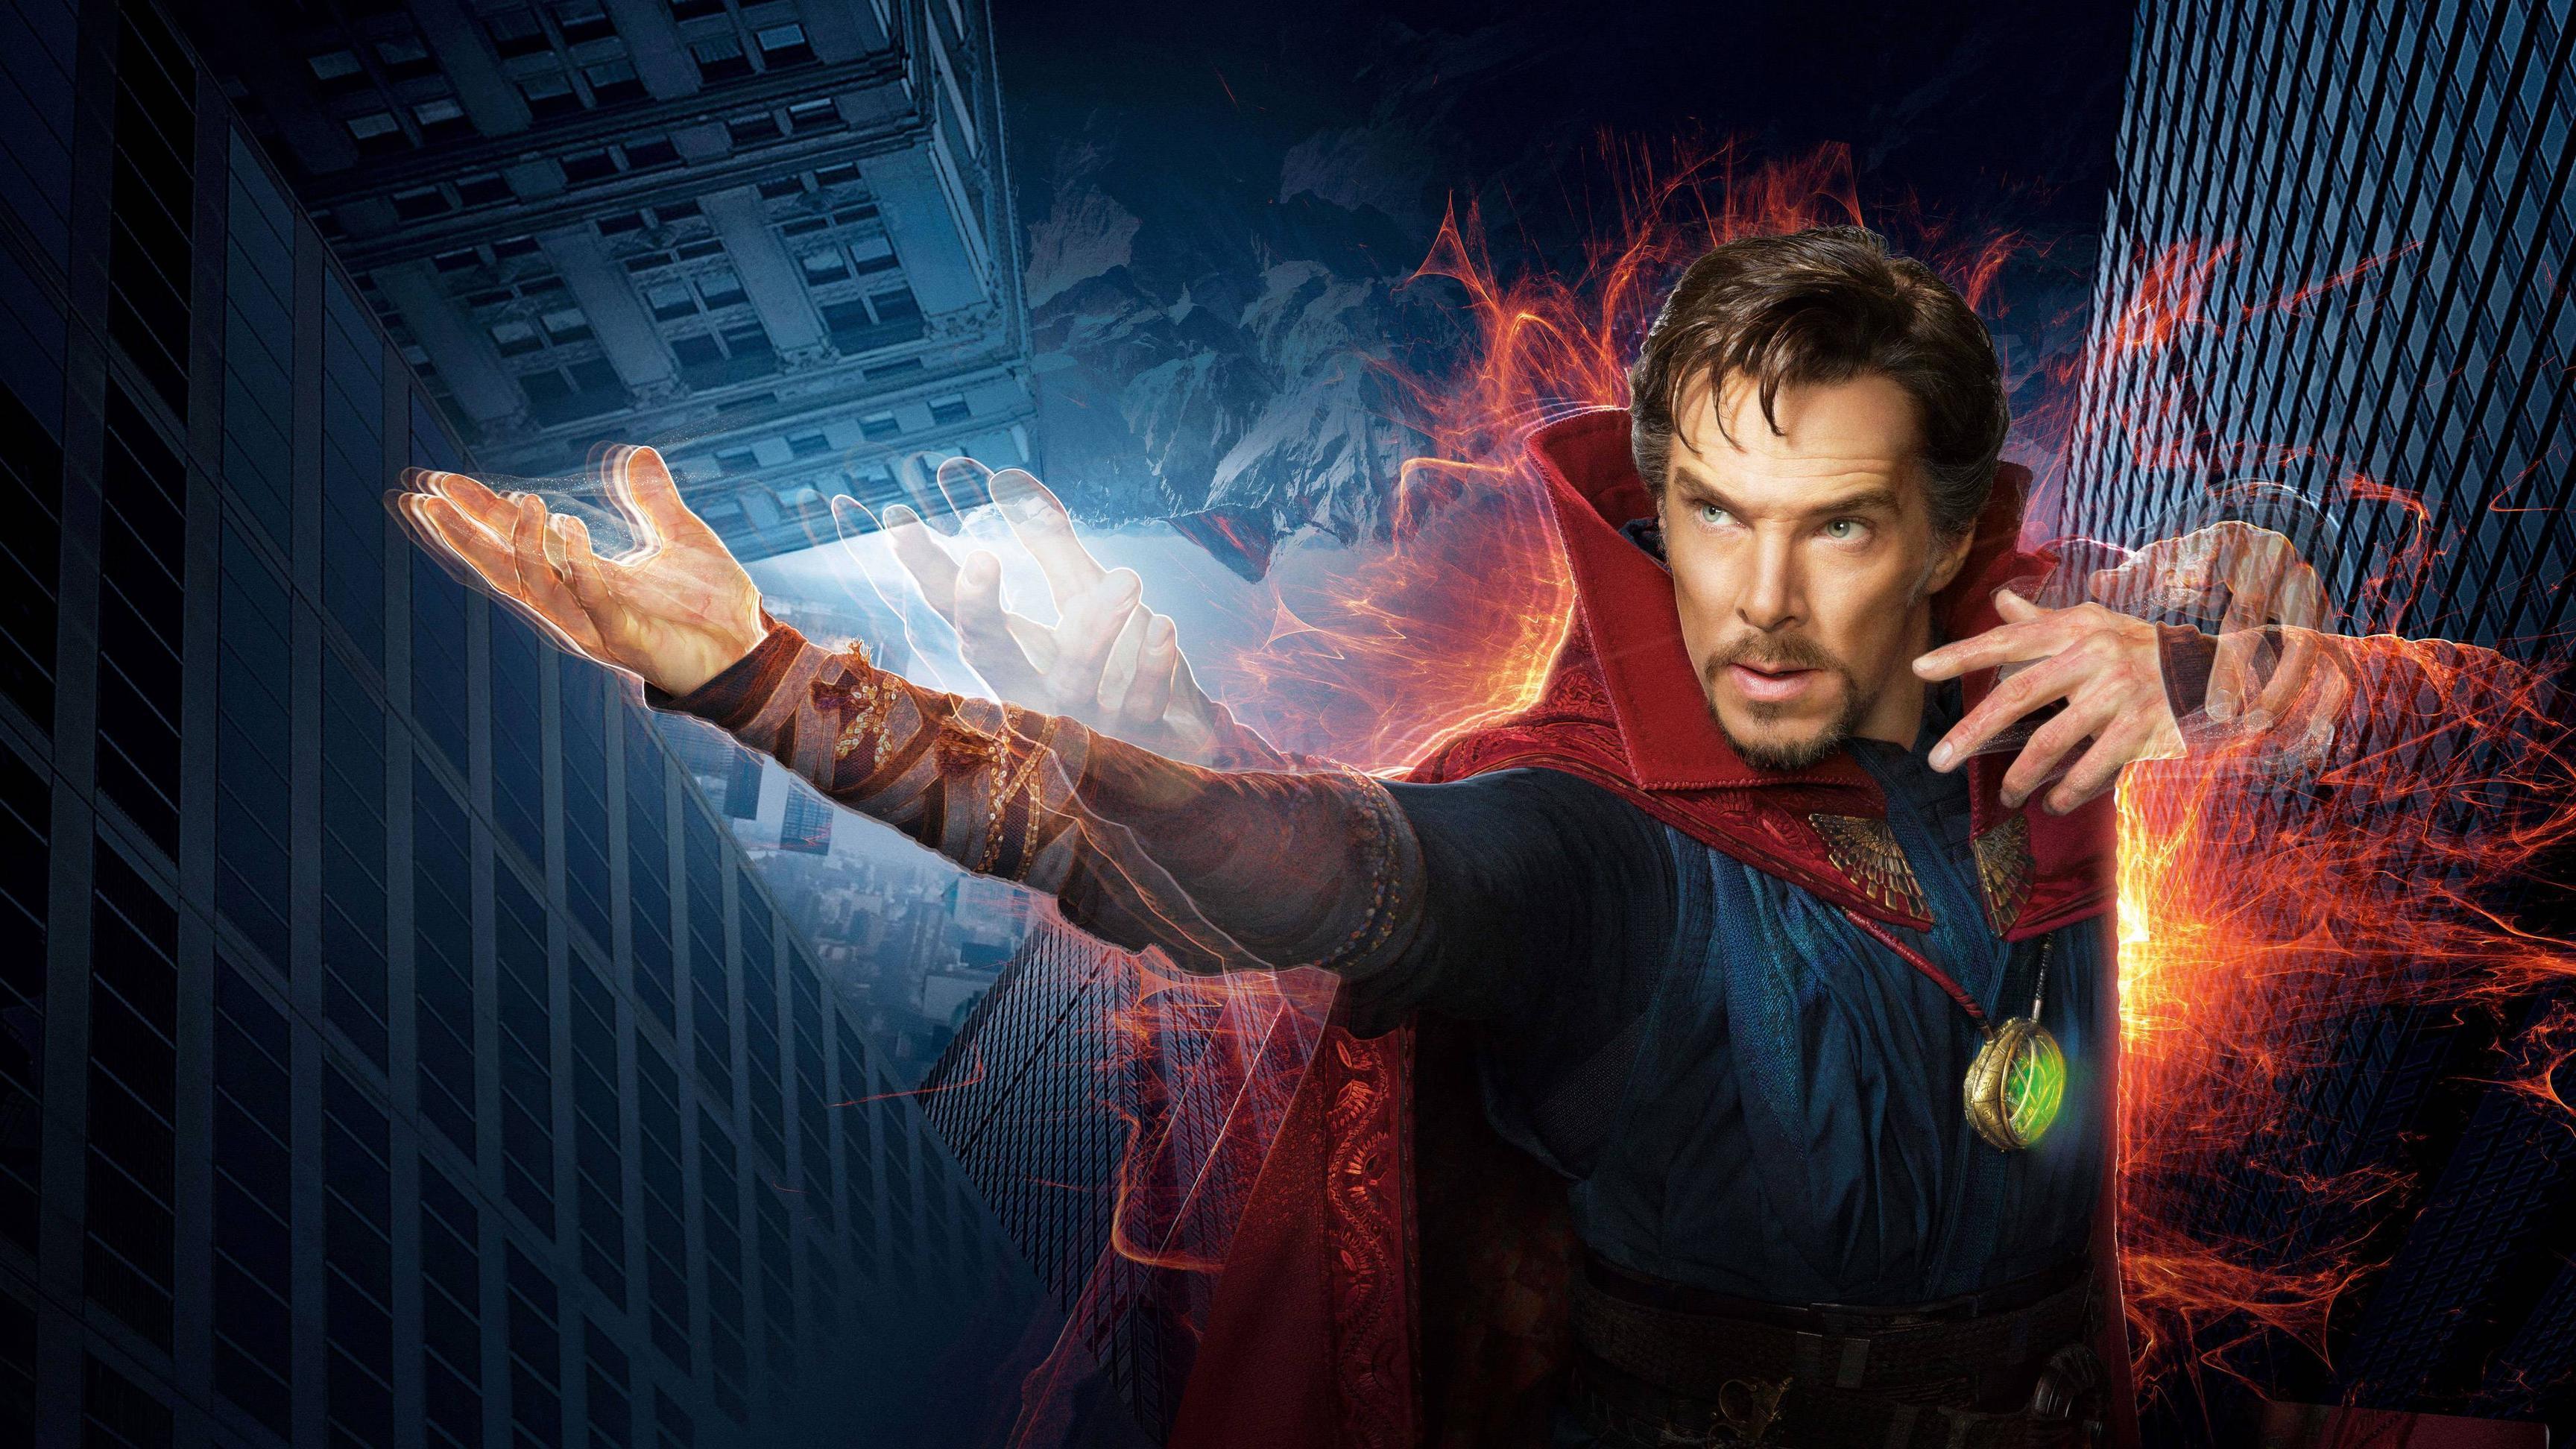 Doctor Strange 4k Wallpapers Top Free Doctor Strange 4k Backgrounds Wallpaperaccess